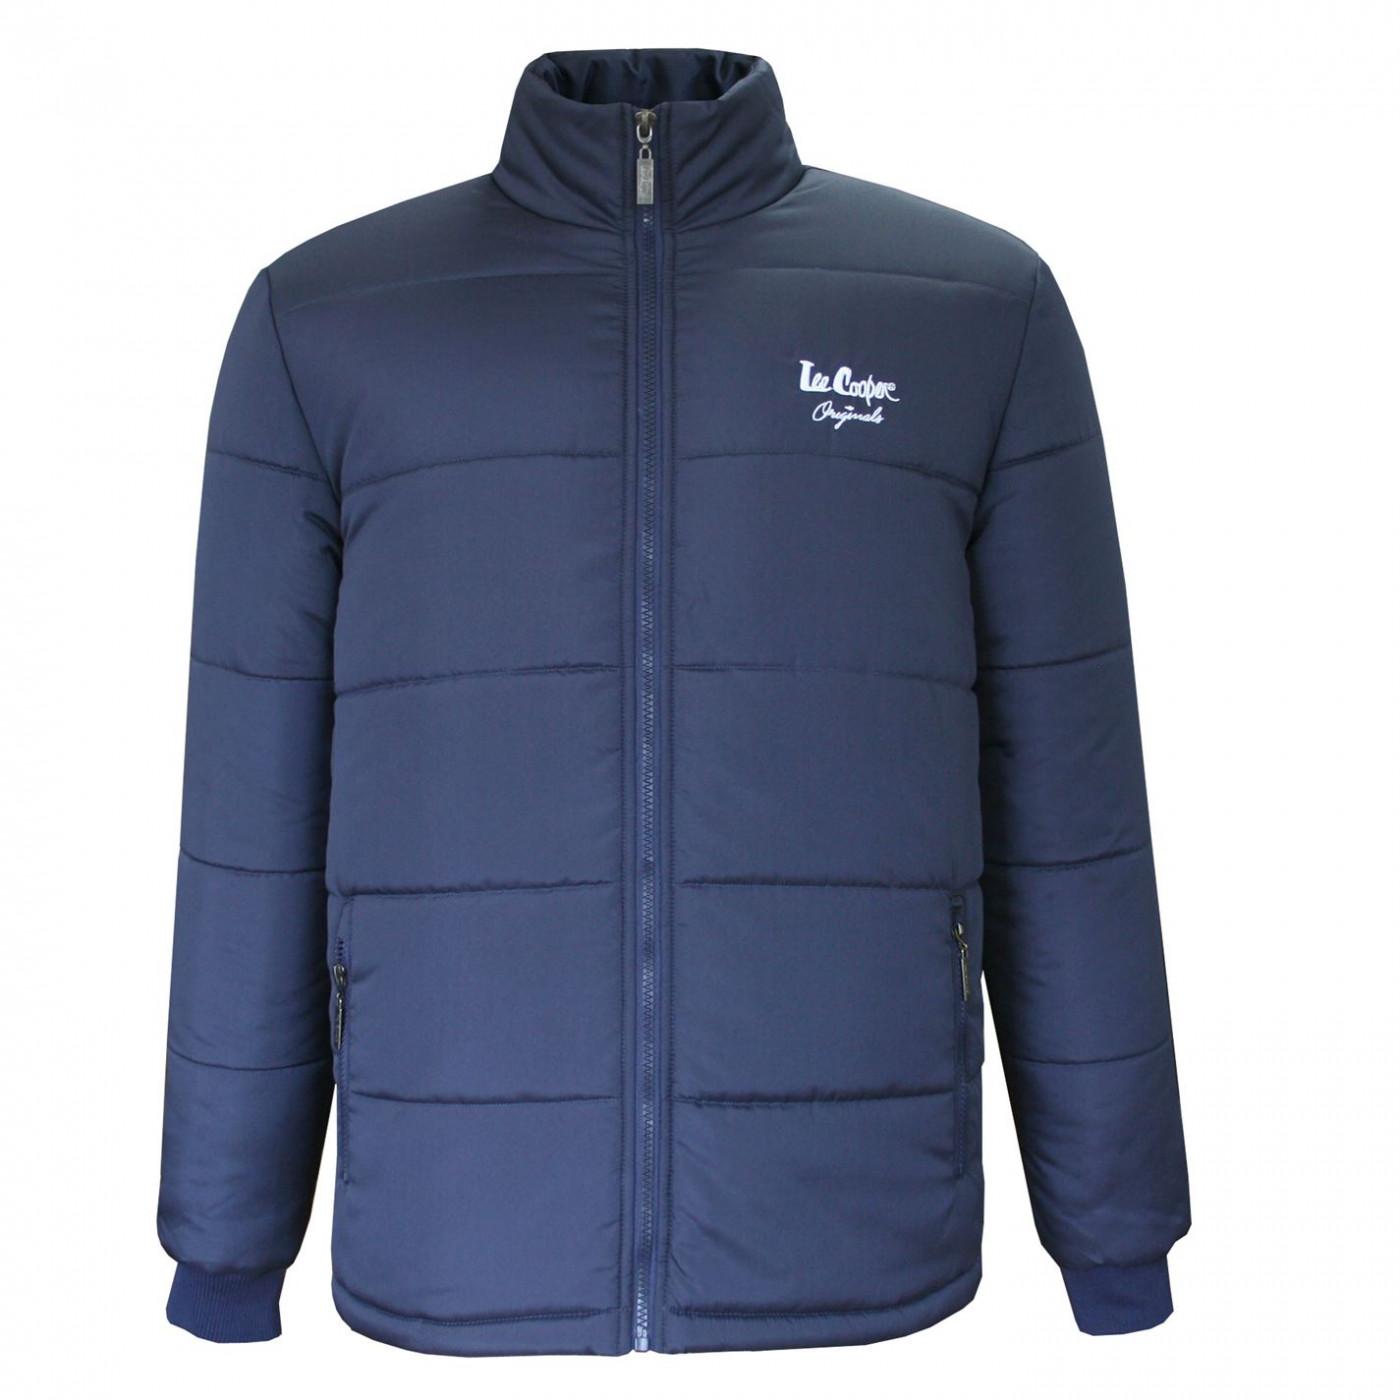 Lee Cooper Padded Jacket Mens